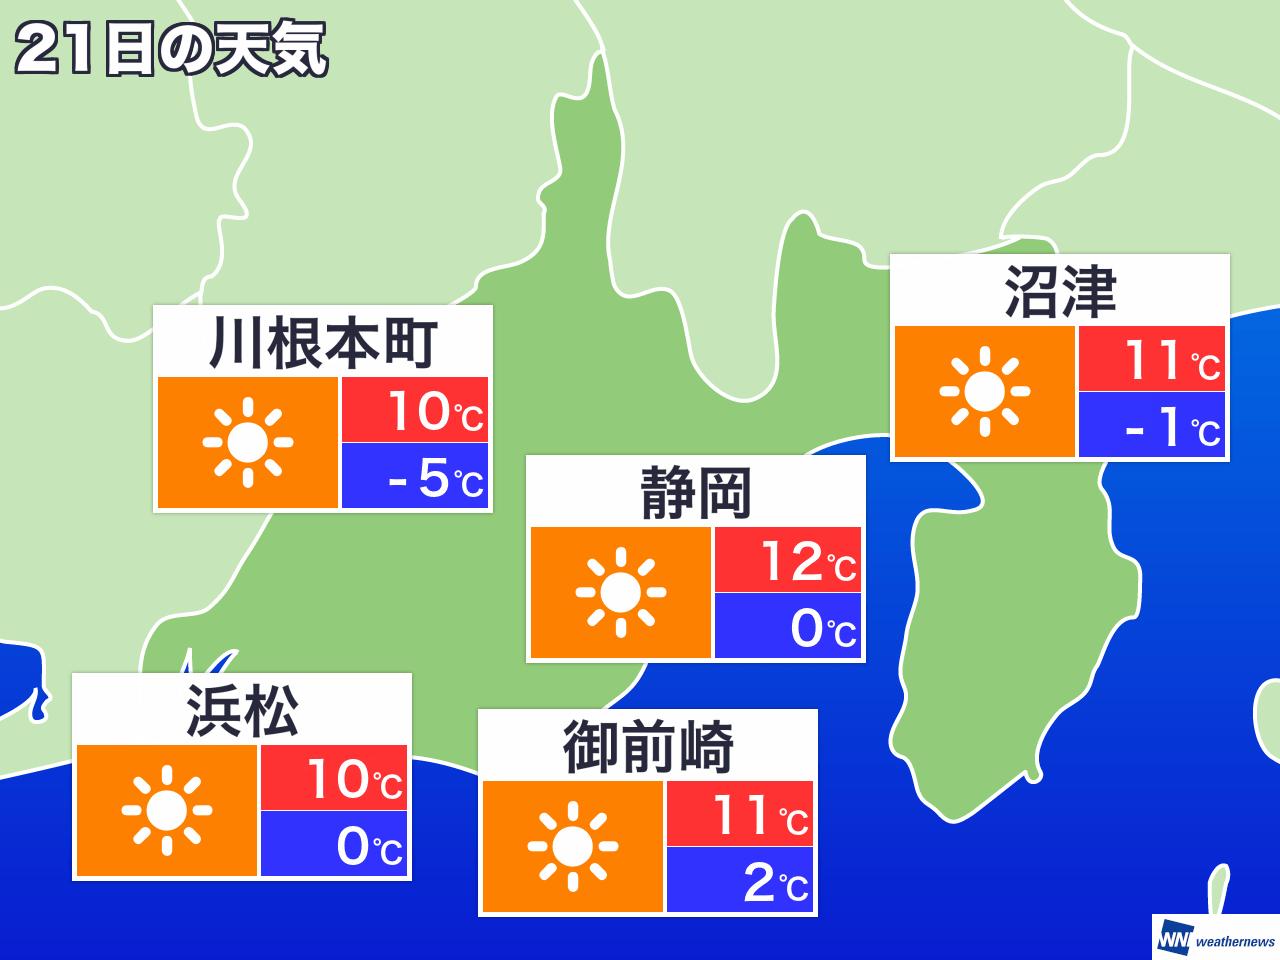 雨雲 レーダー 県 福岡